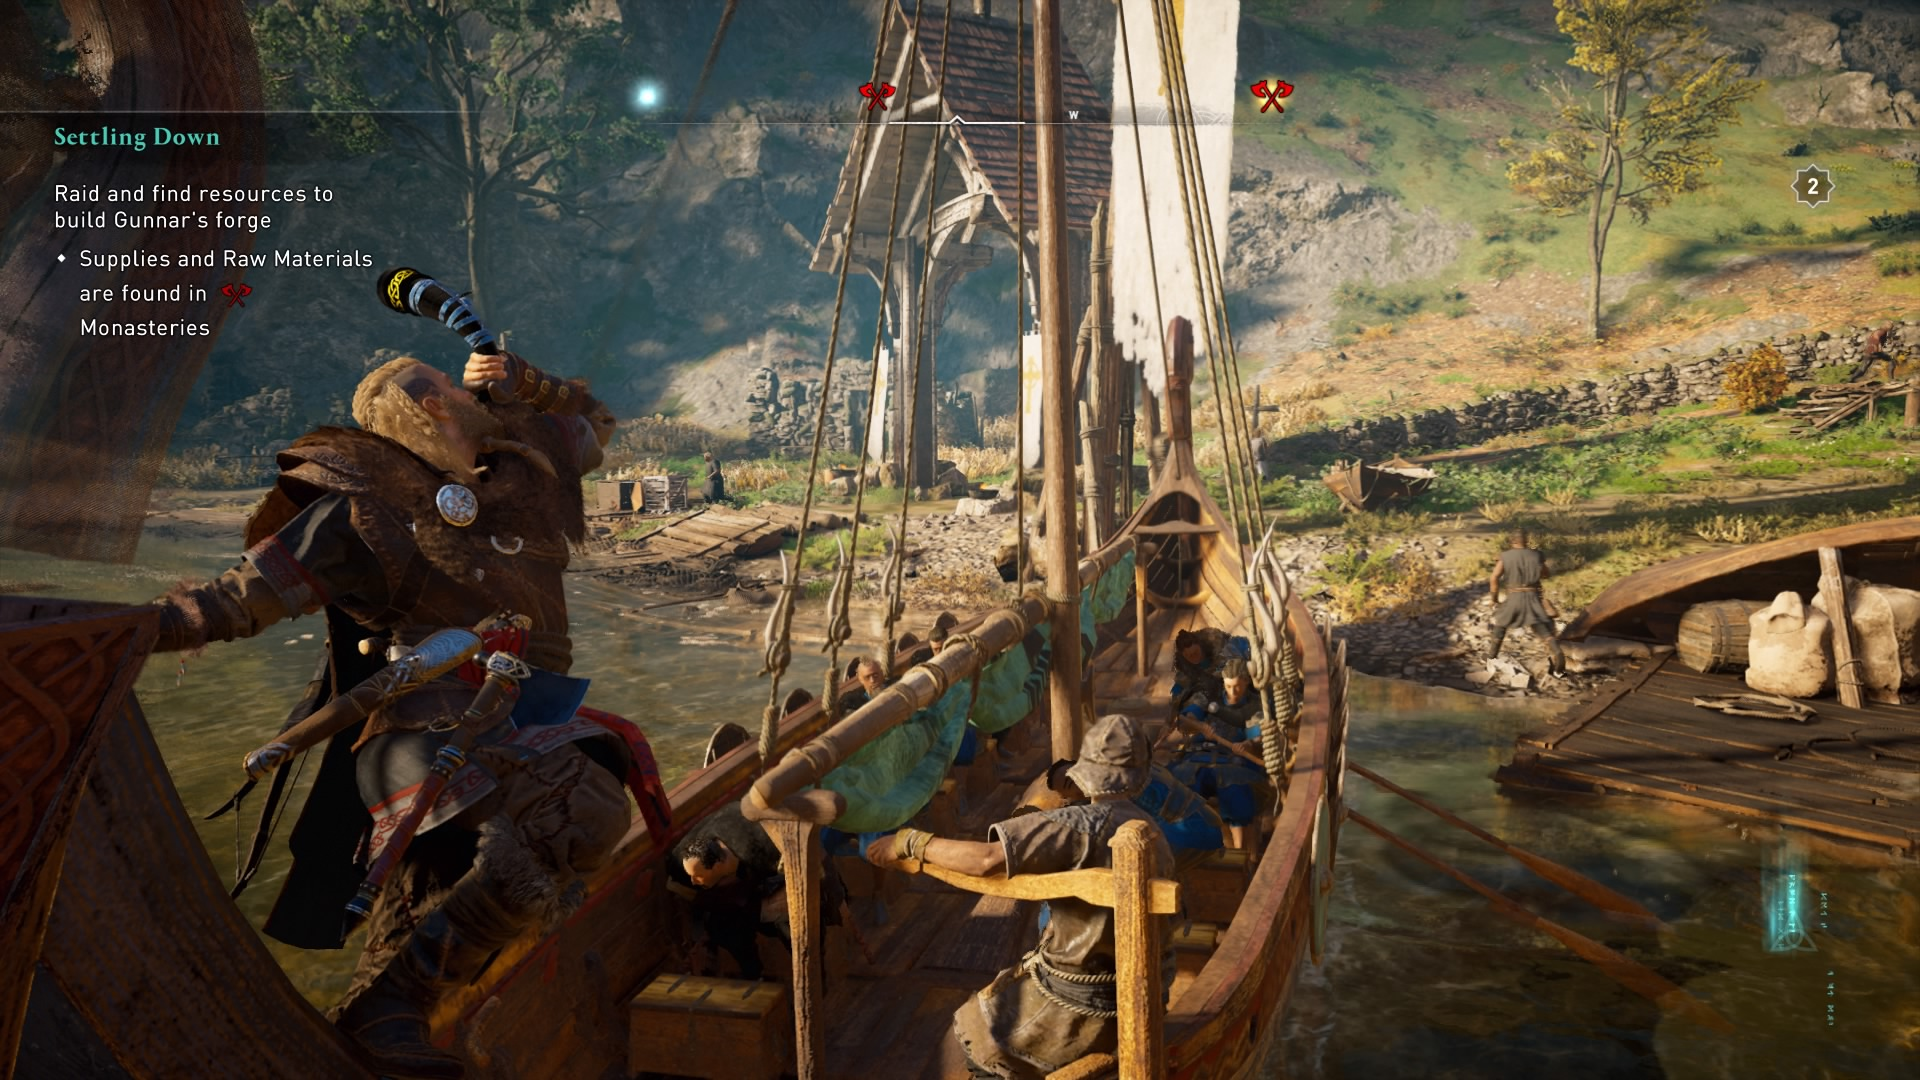 Evior launches a raid in Assassin's Creed Valhalla. 8Bit/Digi